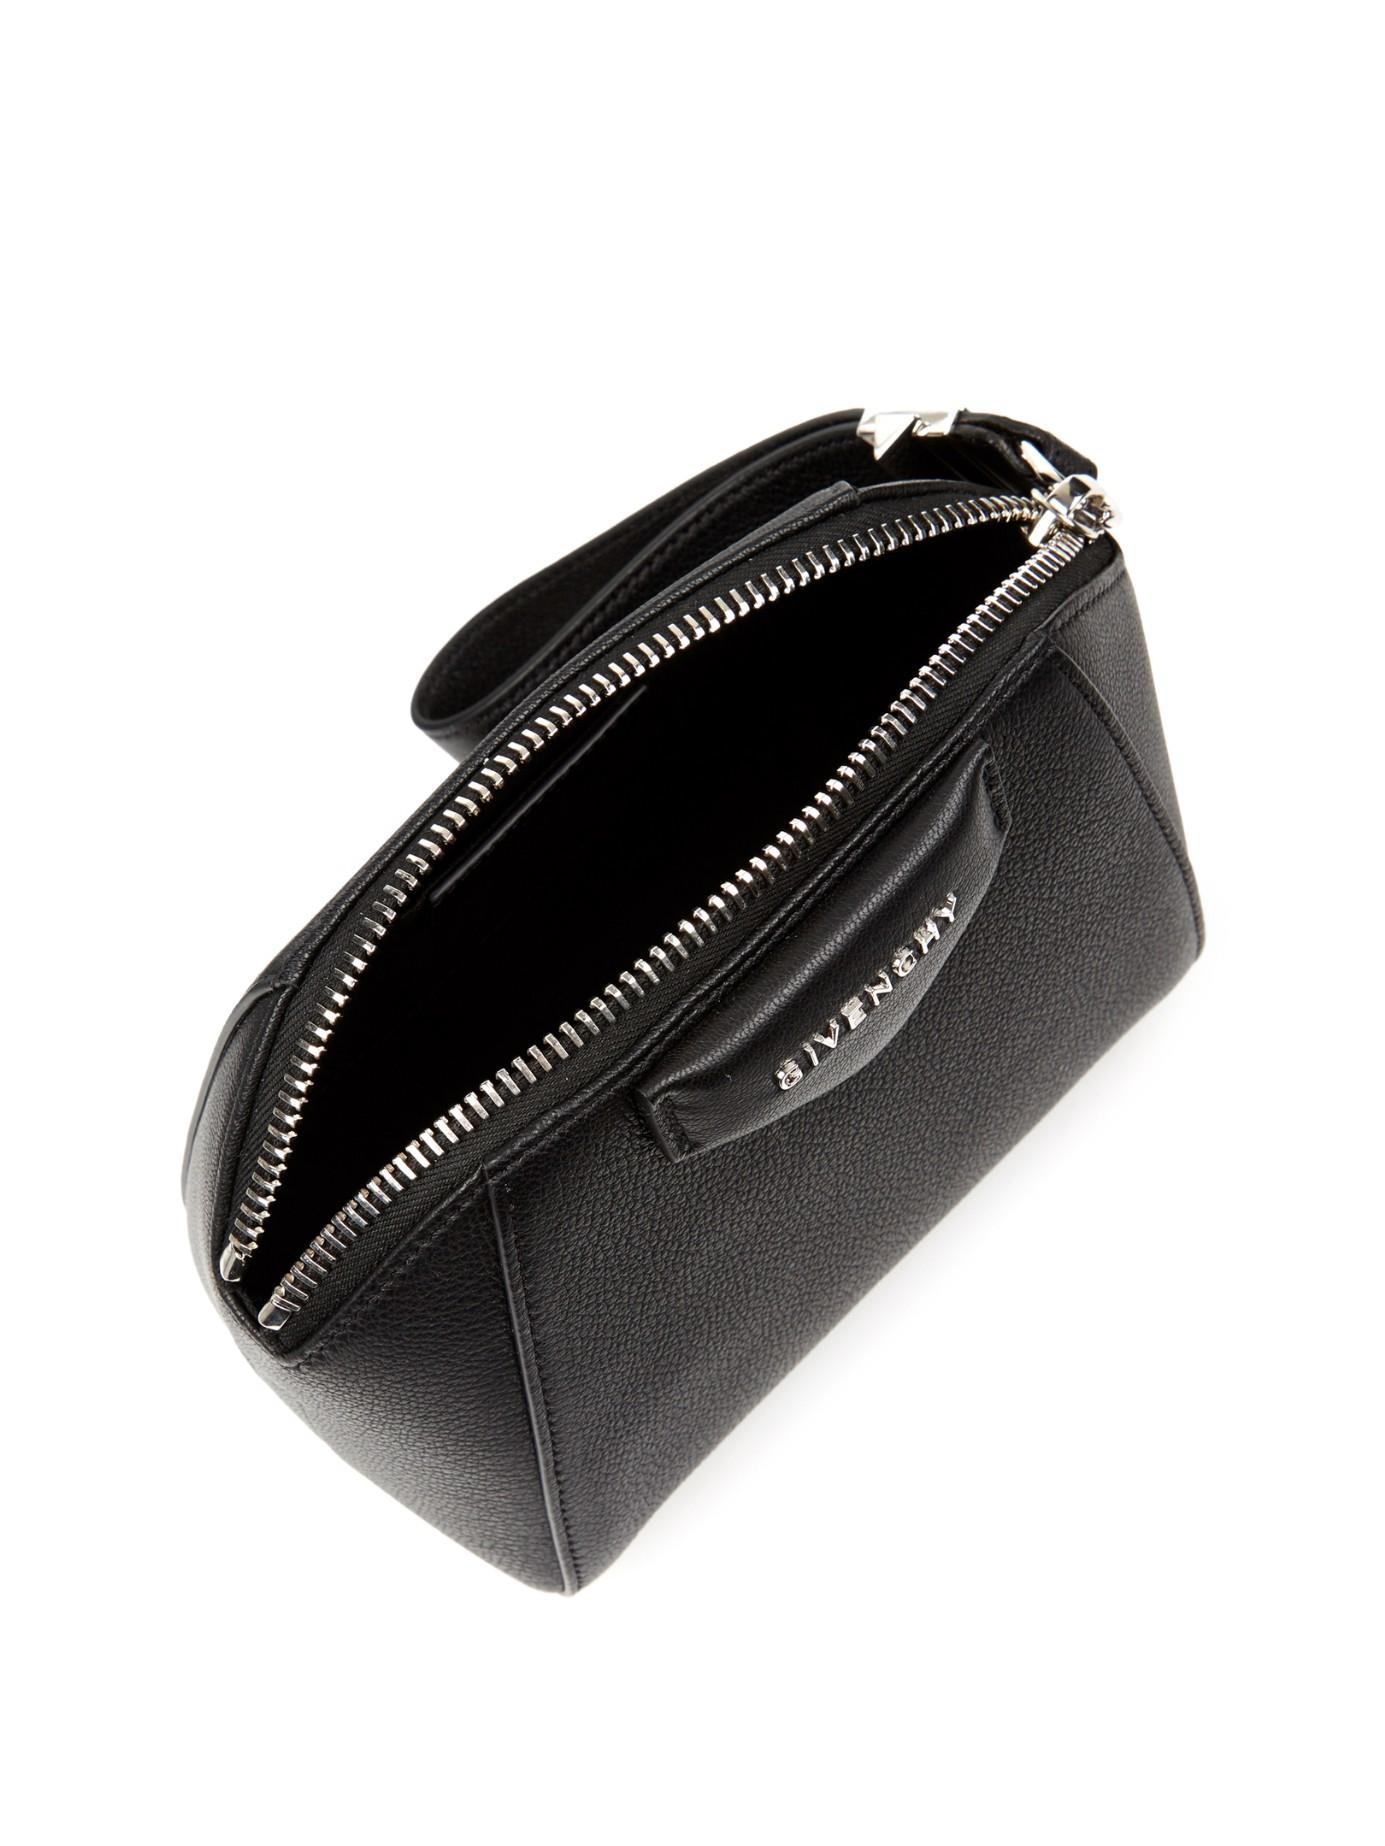 1e47a39e5c1 Givenchy Antigona Beauty Sugar-leather Clutch in Black - Lyst